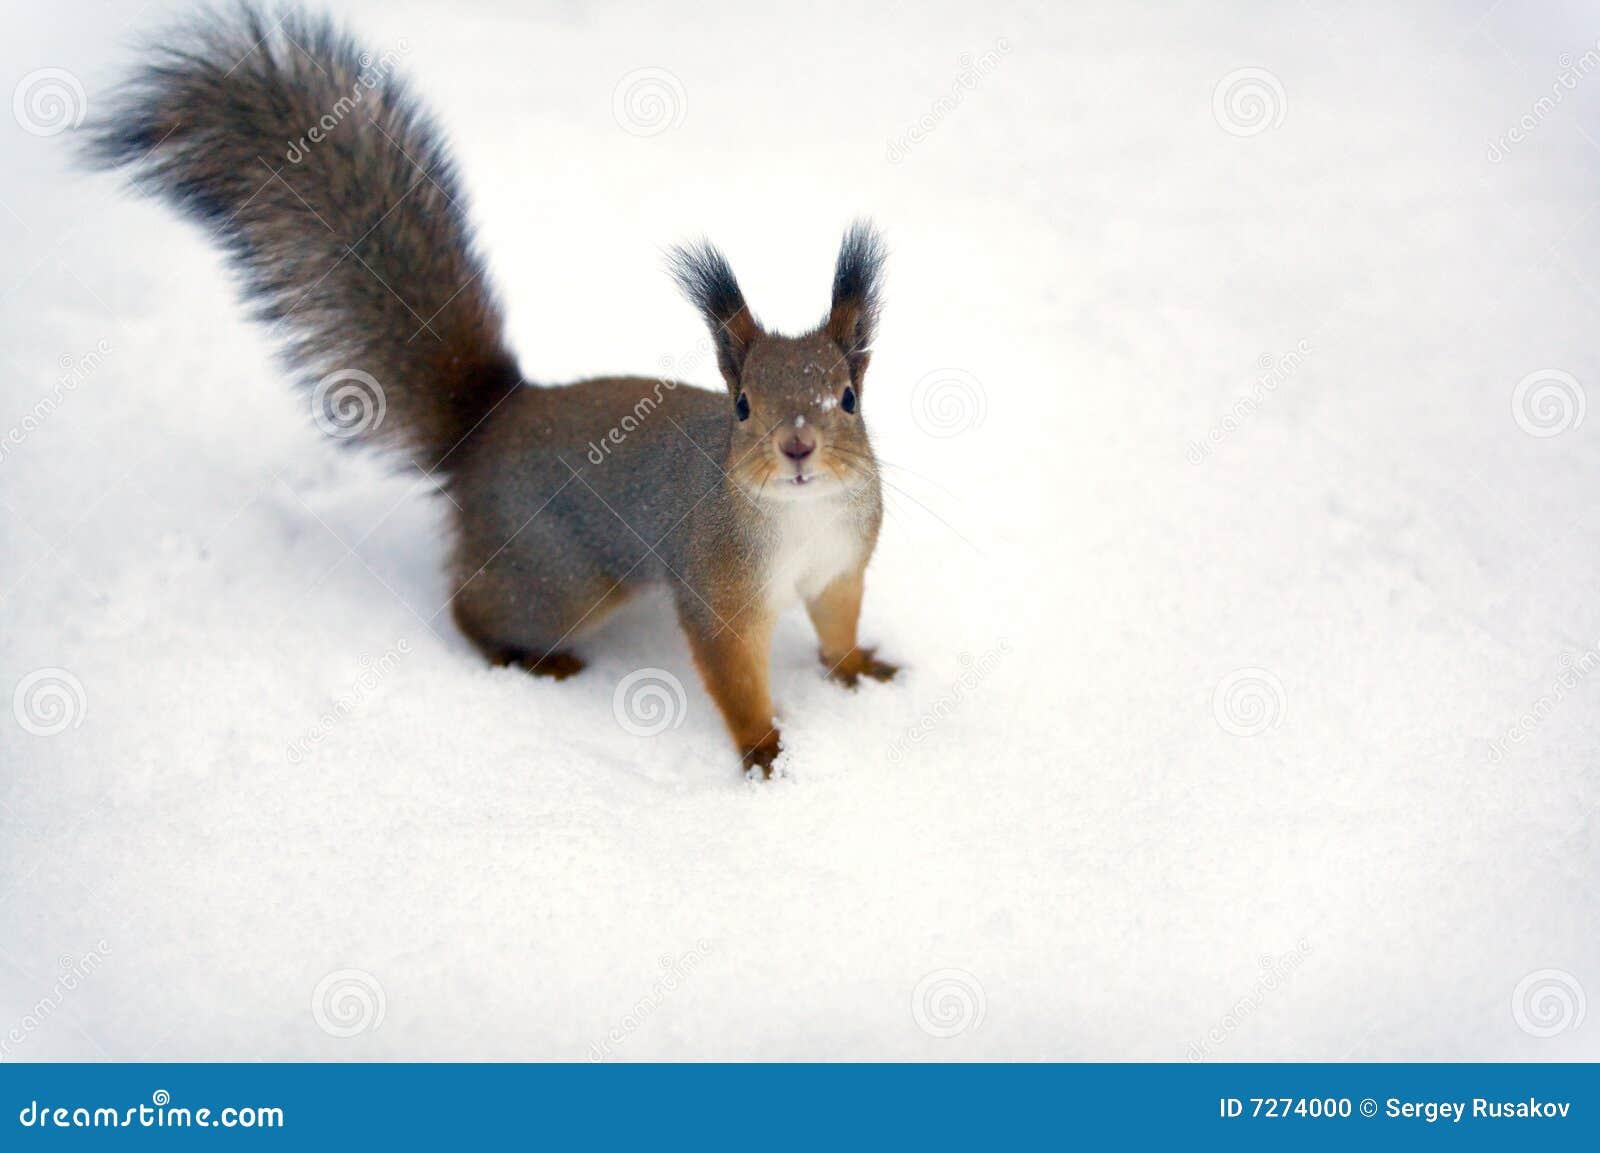 A squirrel background.